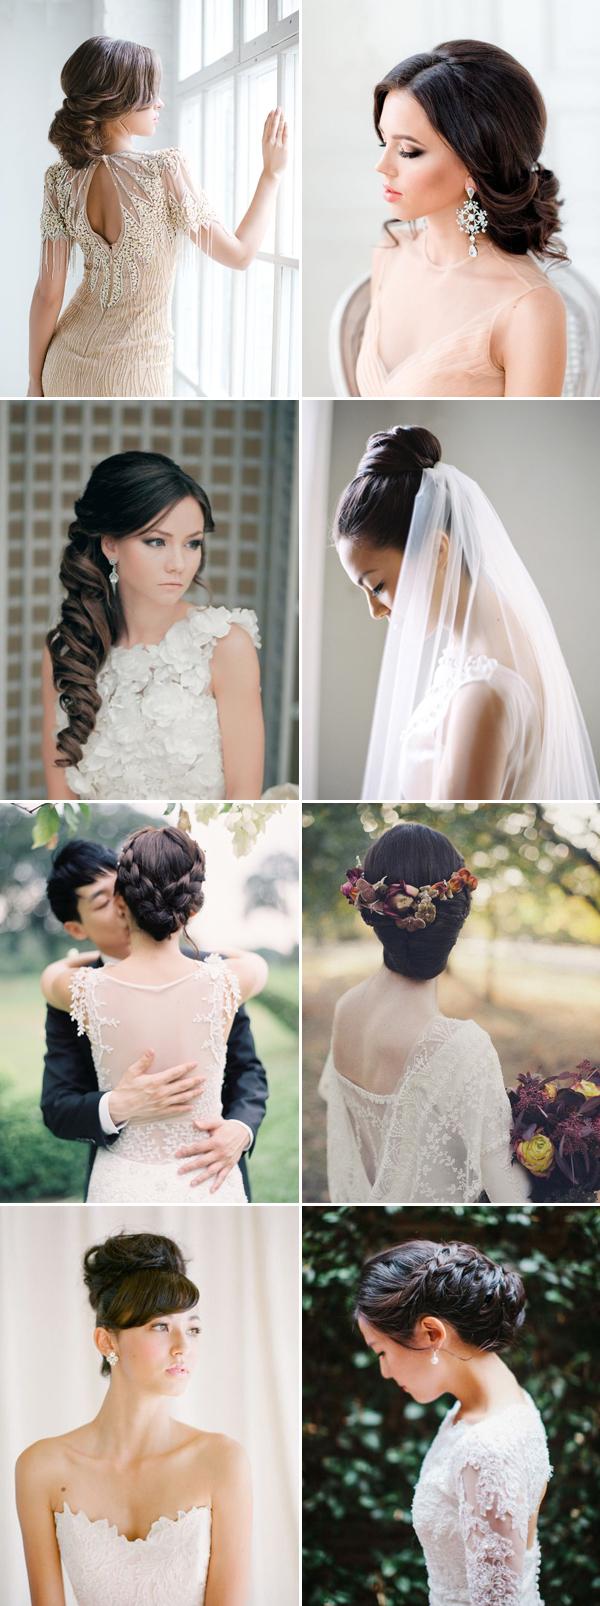 28 gorgeous hairstyles for brides with dark hair - praise